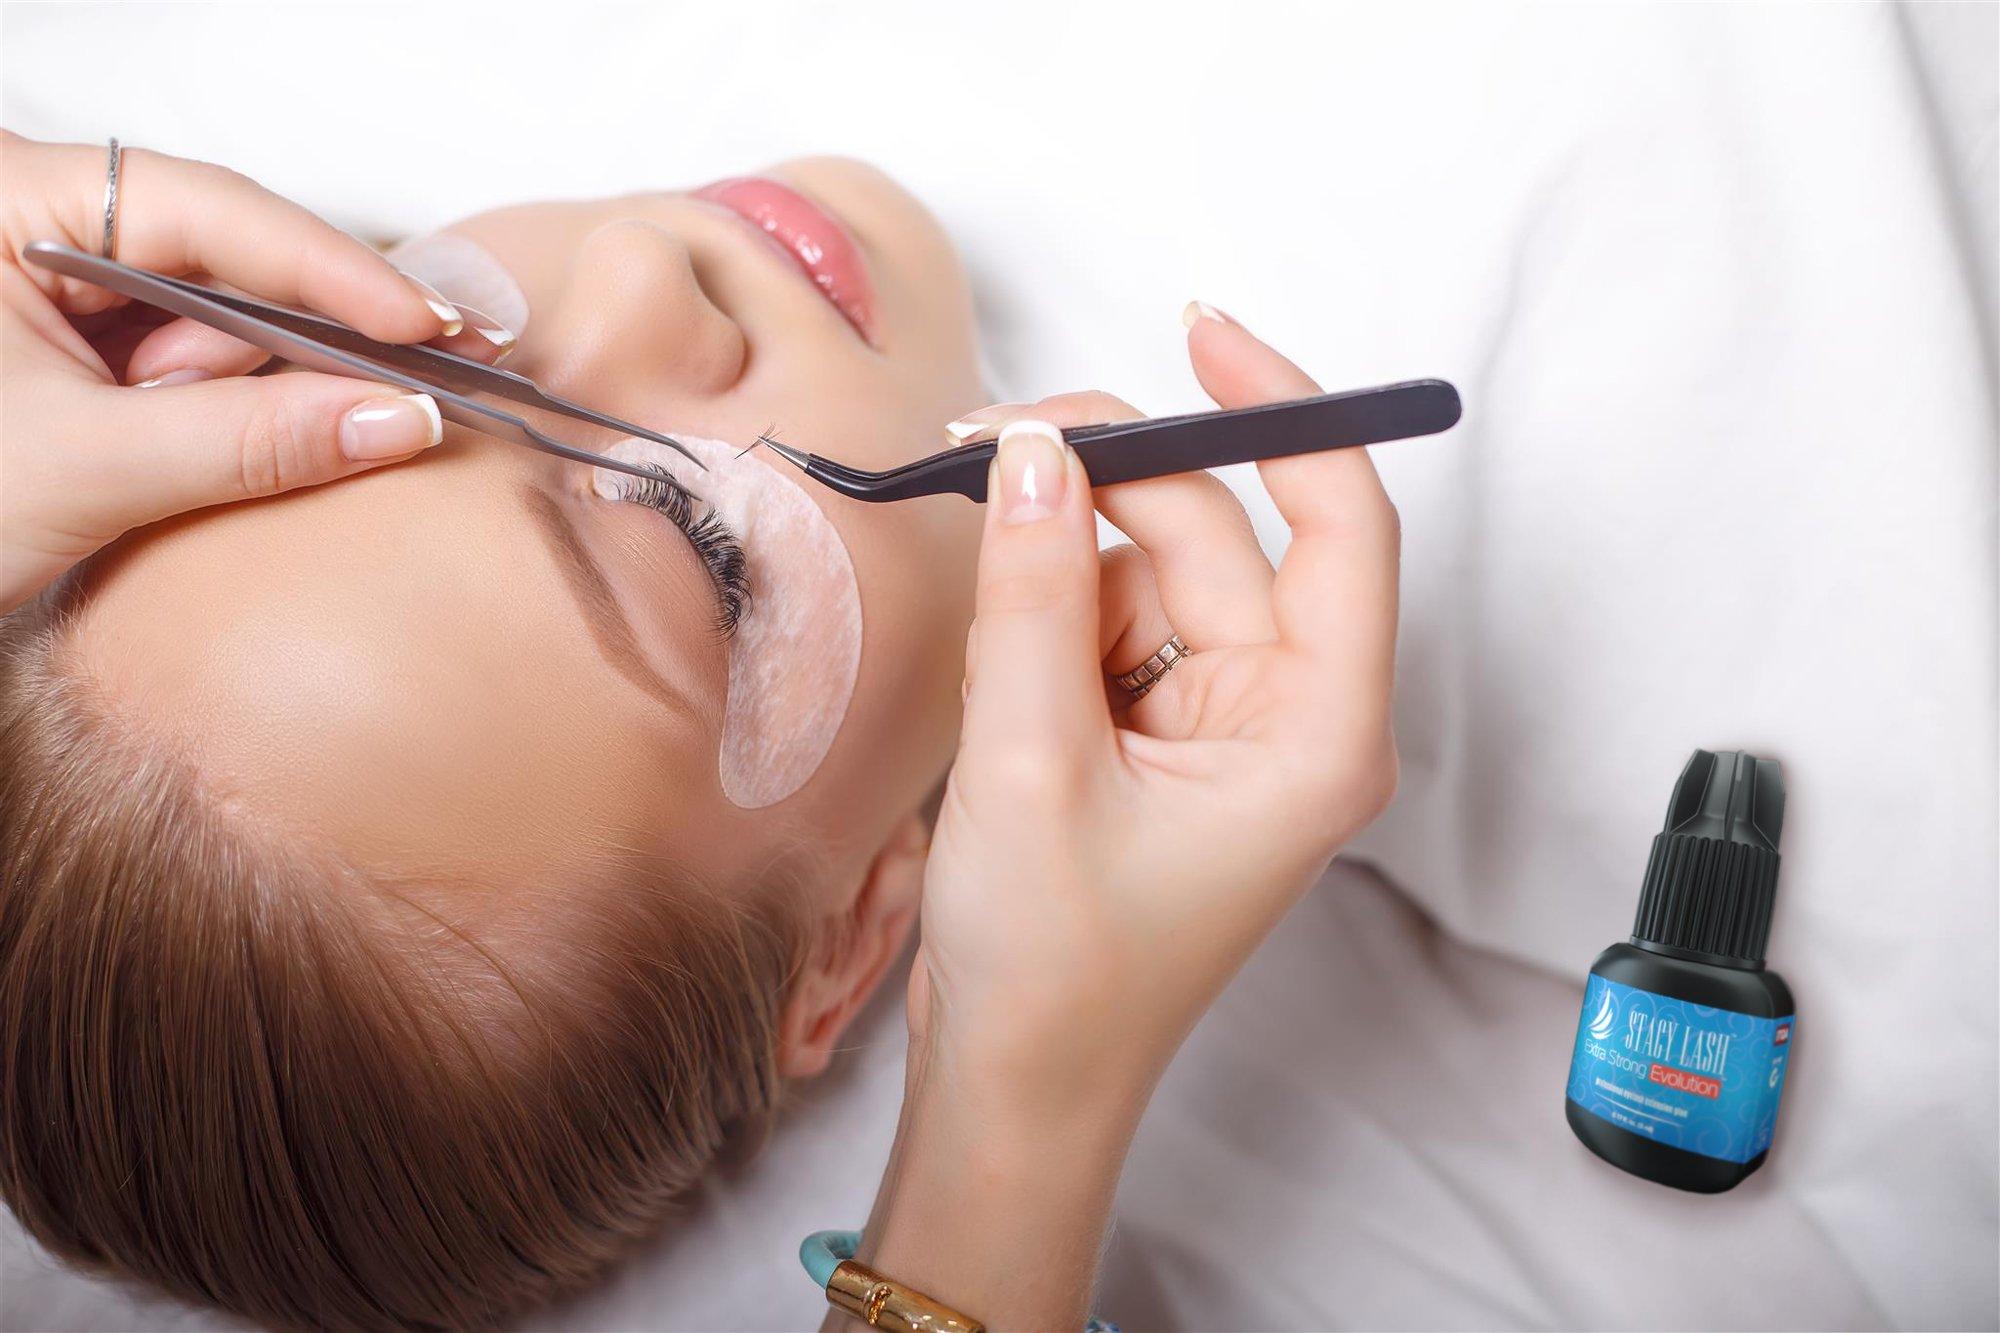 Extra Strong Evolution Eyelash Extension Glue Stacy Lash 5 Ml 1 2